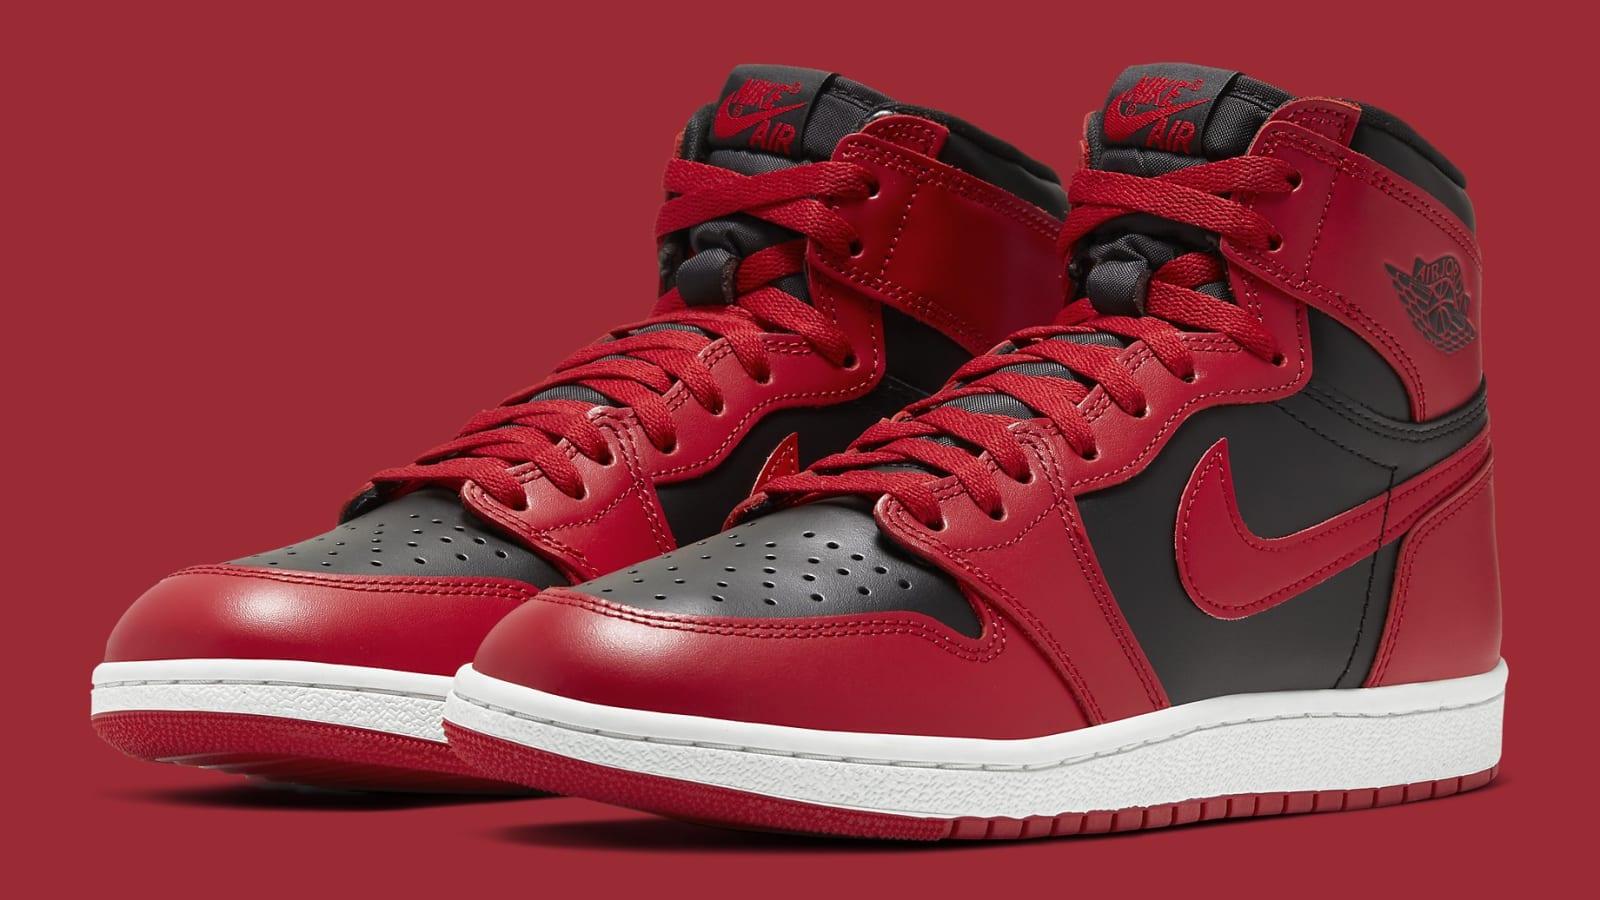 nike shoes cheapest, Air jordan 1 high white varsity red